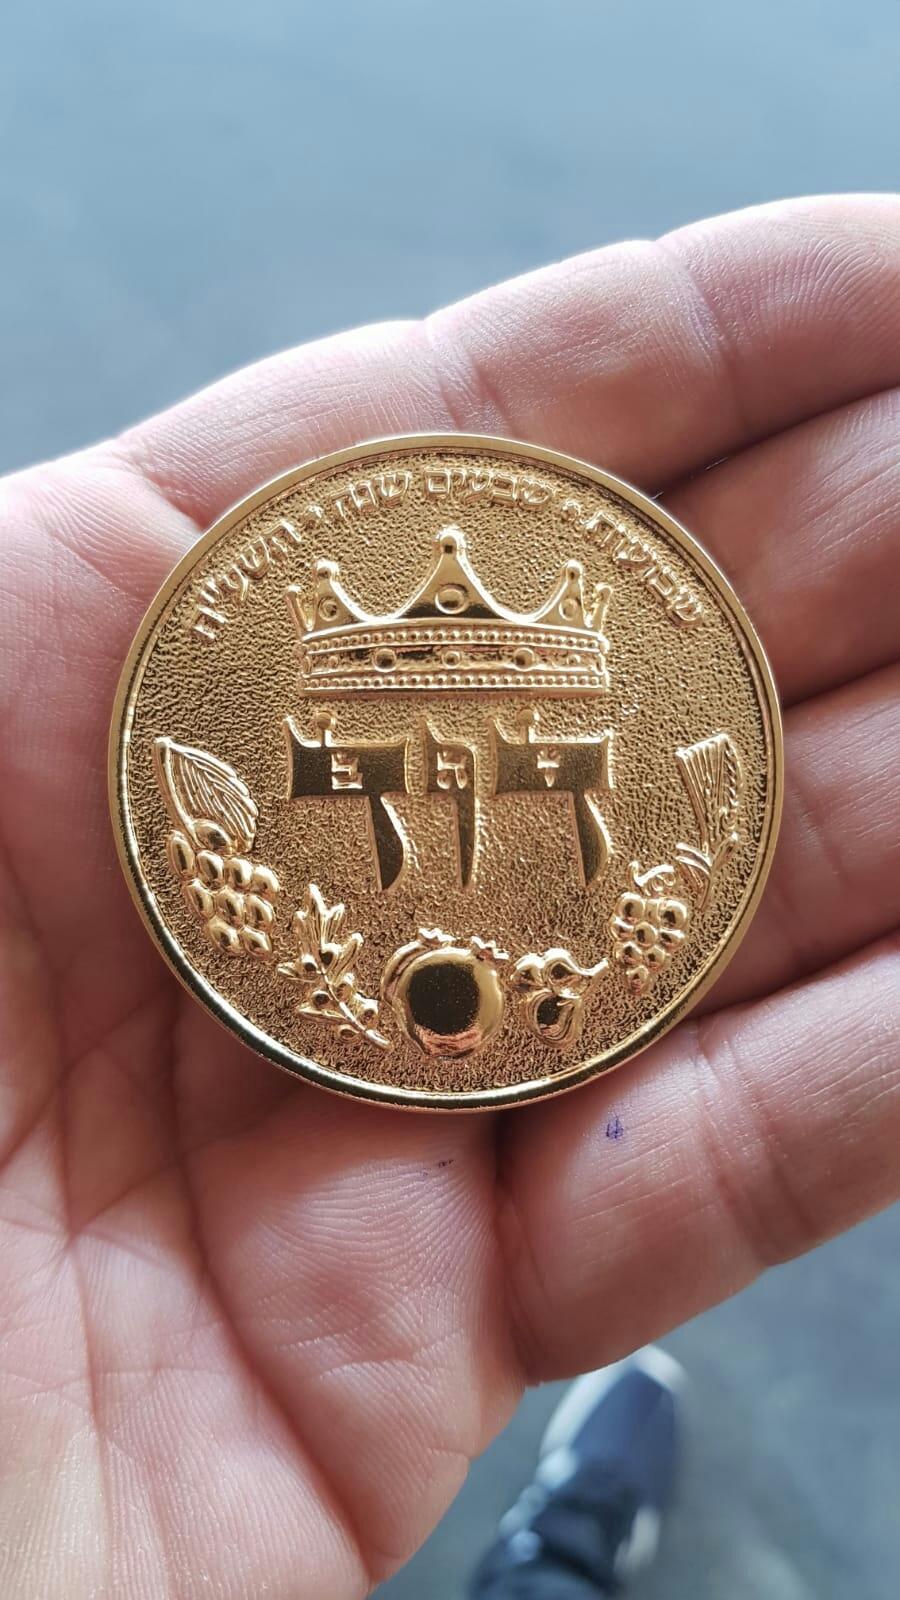 HALF SHEKEL KING DAVID COIN - gold plated 00009